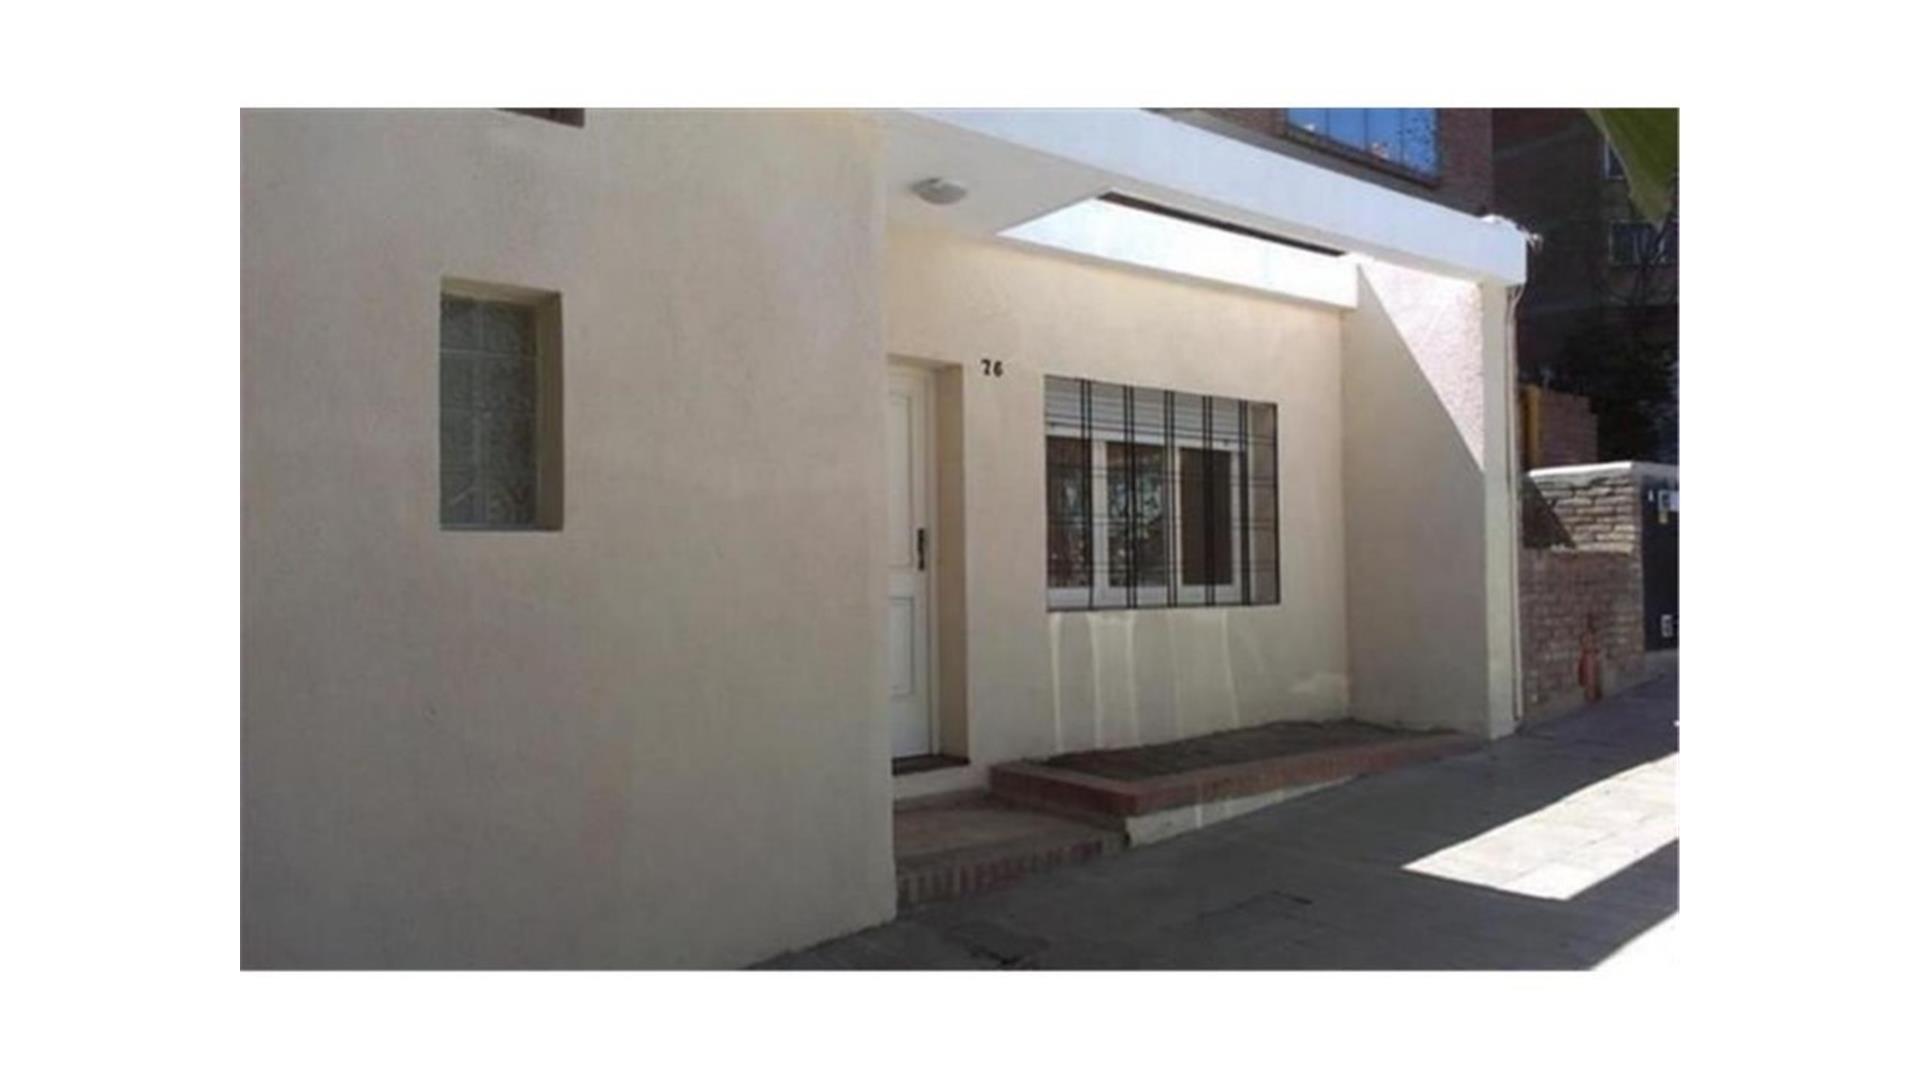 Casa 3 dorm, 2 bñs, 2 patios, APTO PROFESIONAL!